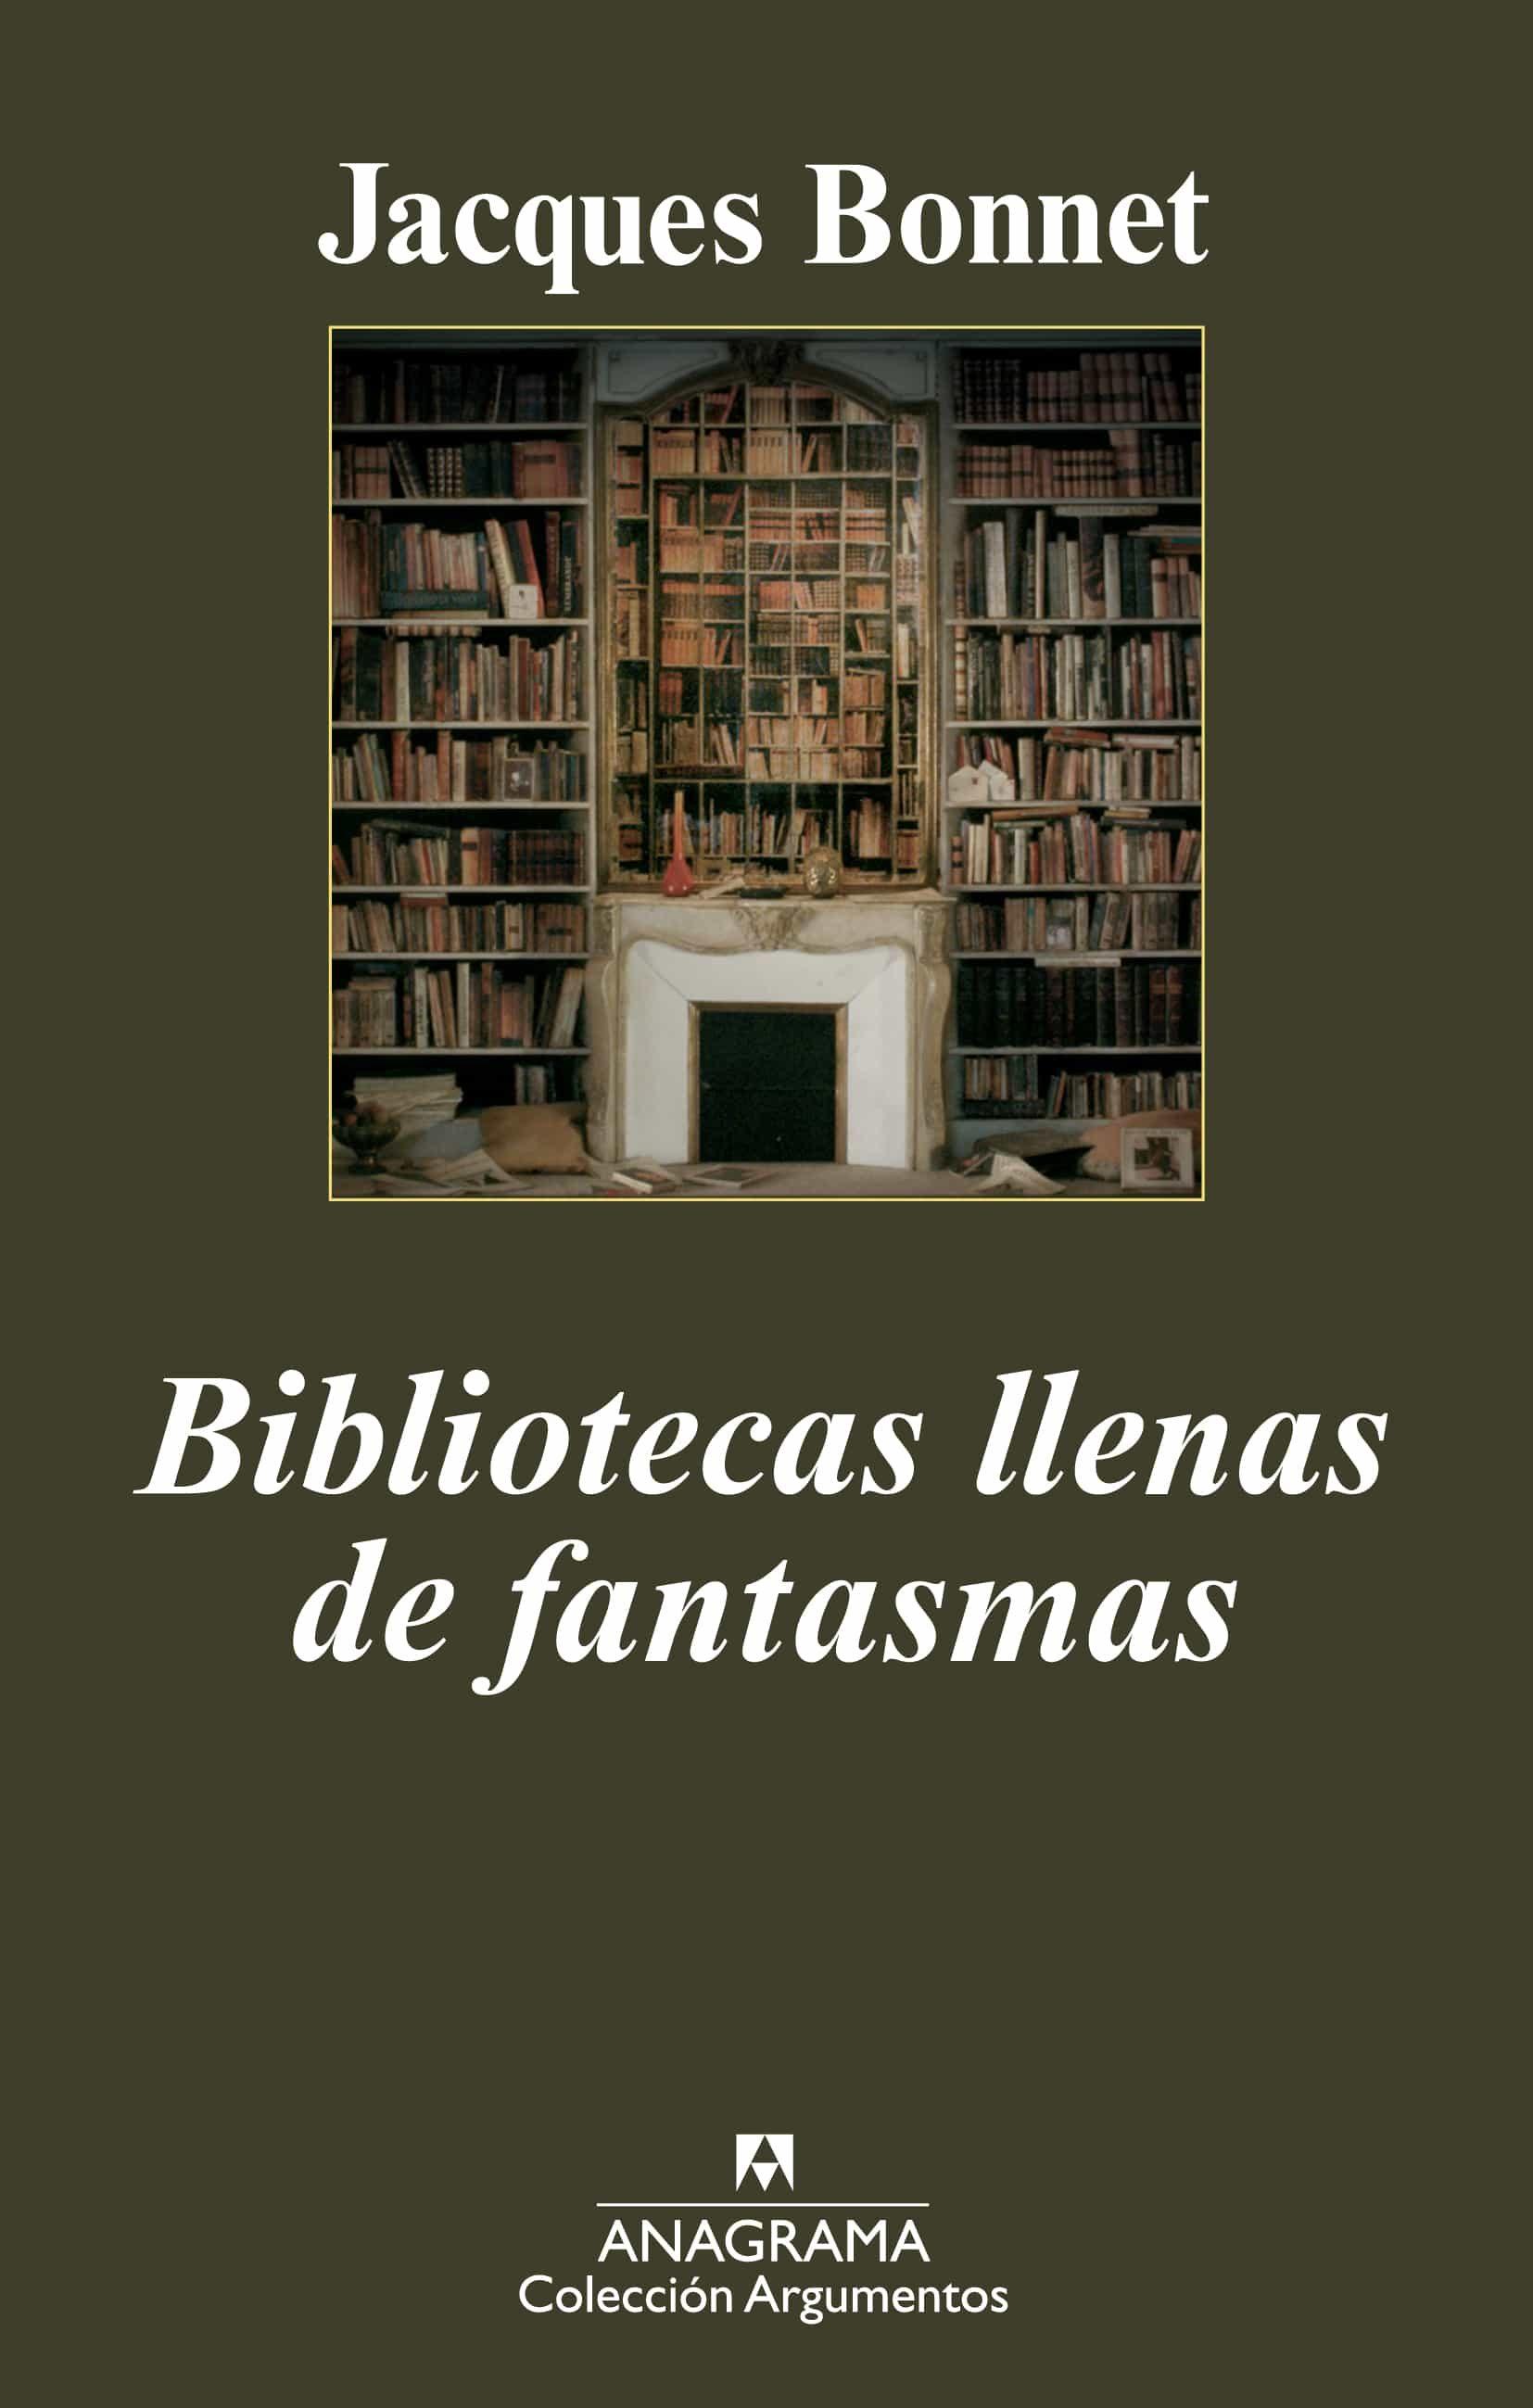 bibliotecas llenas de fantasmas-jacques bonnet-9788433963062